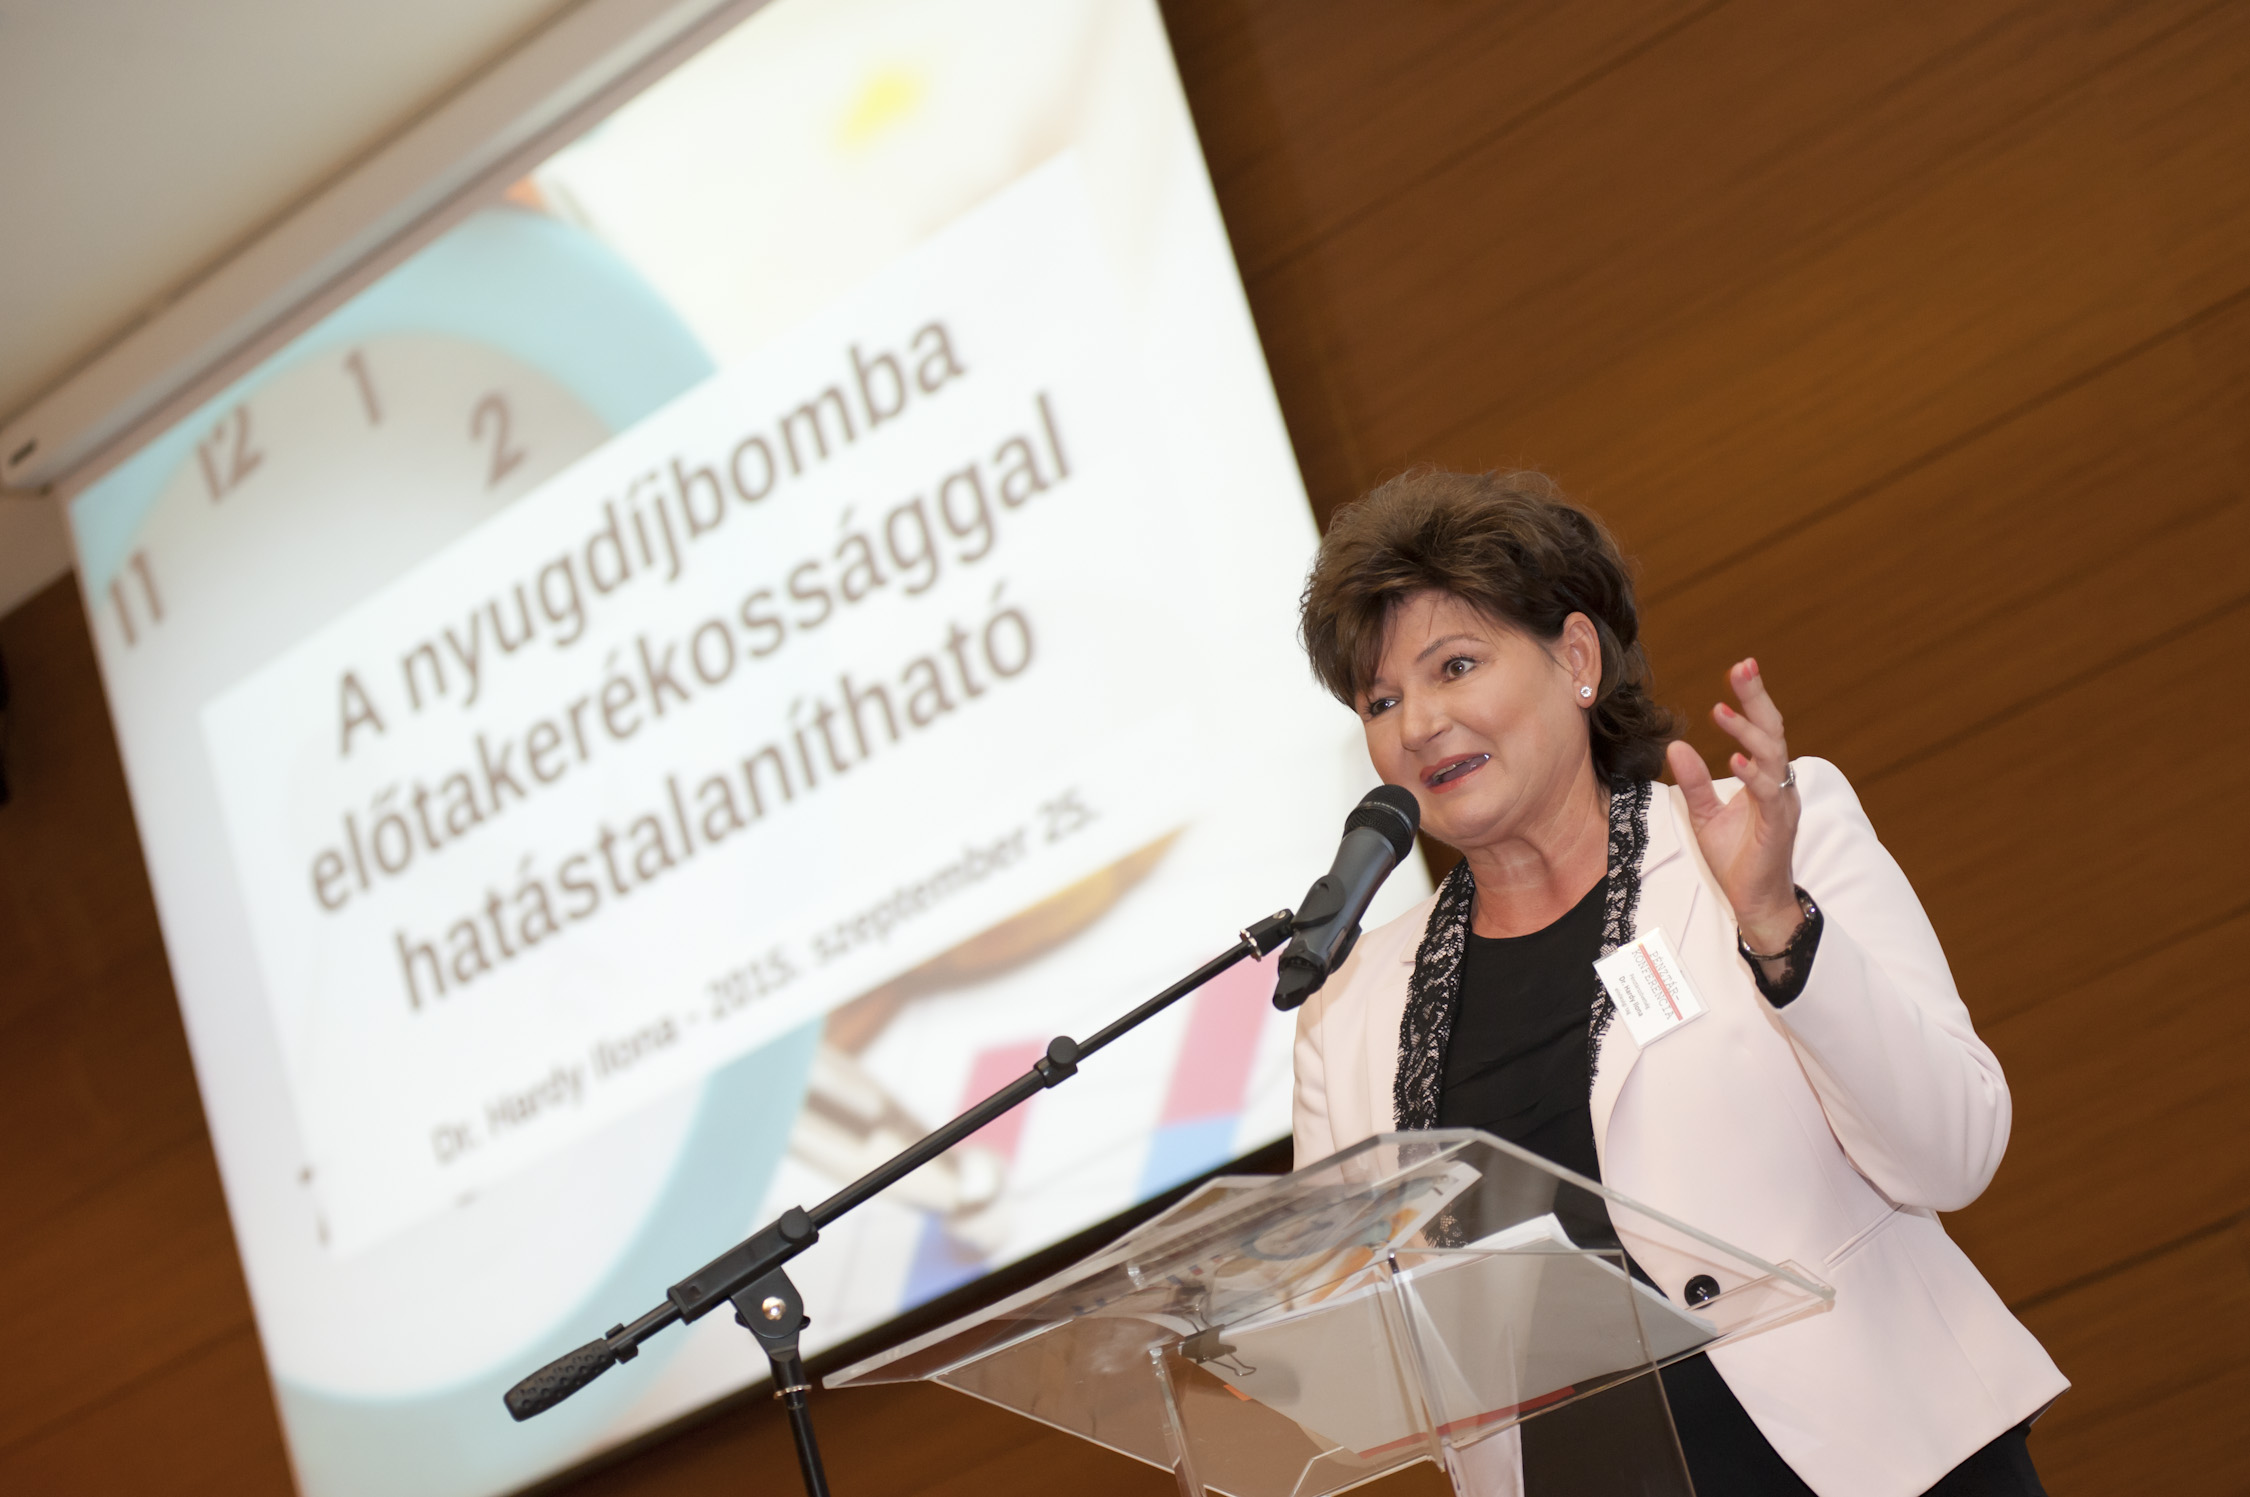 Dr. Hardy Ilona